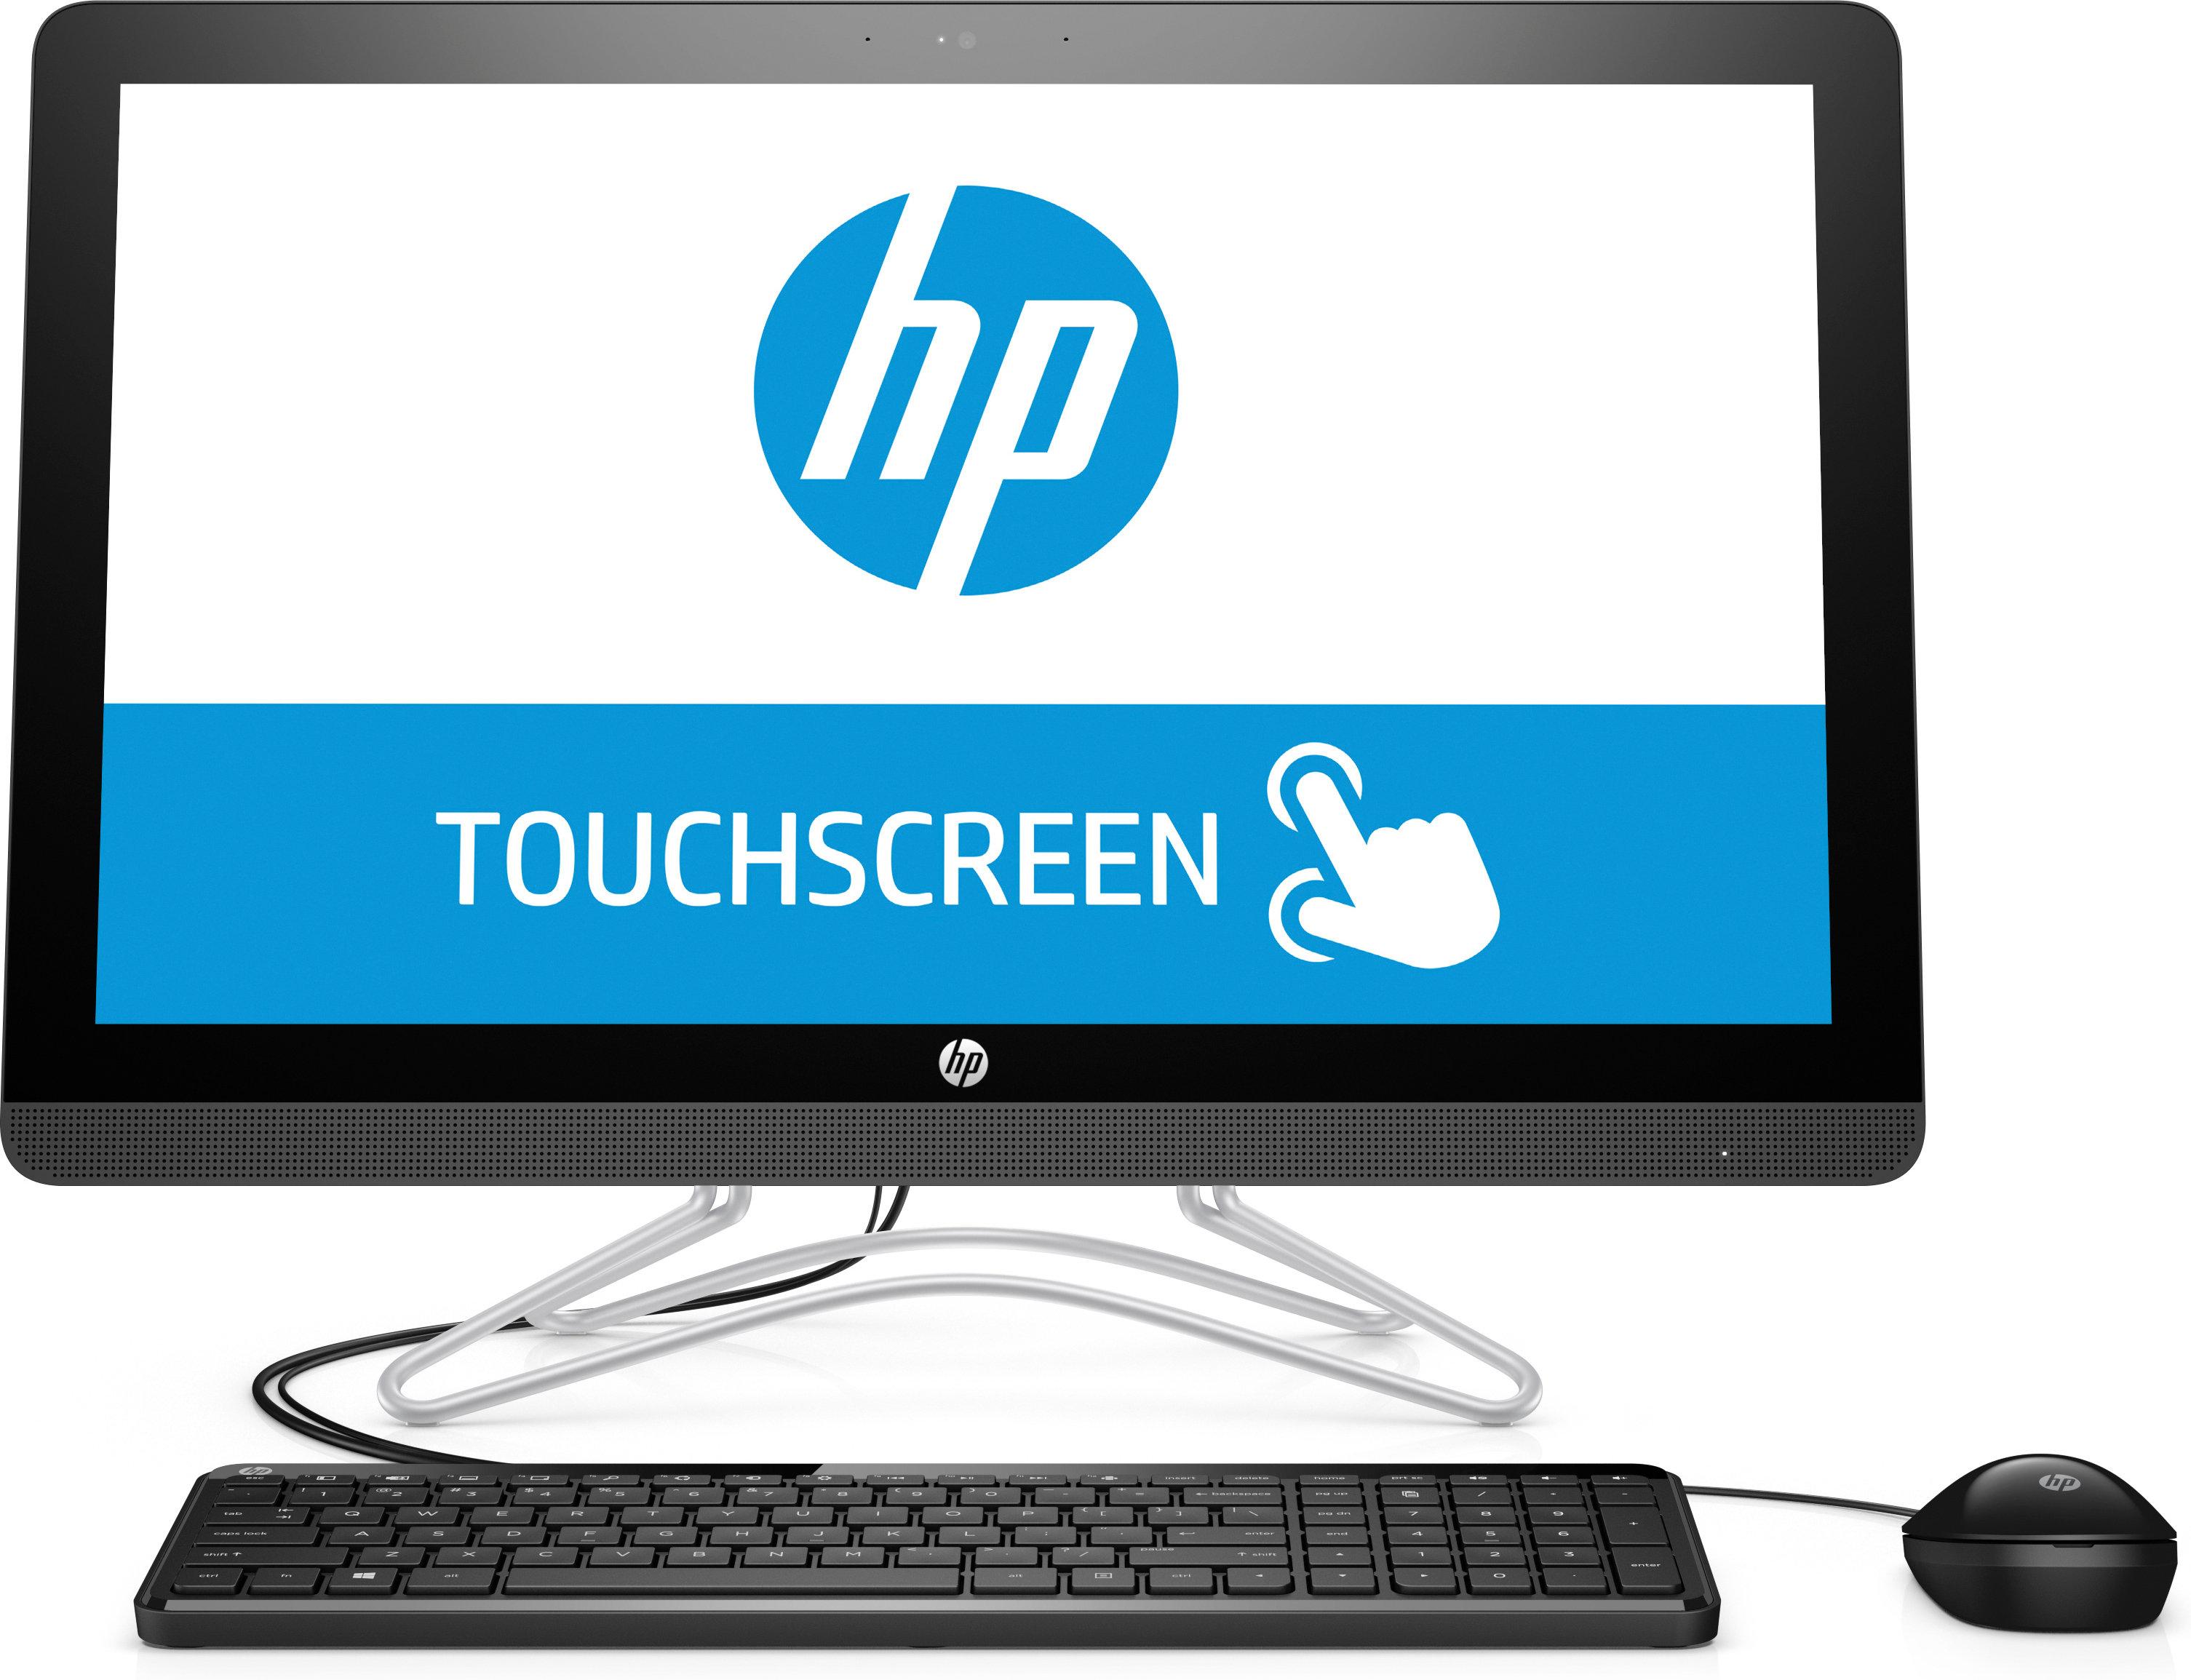 Electronicshop24 Notebooks Computer Tvs Und Vieles Mehr Zu Top Lenovo Ideacentre Aio 510 22ish Core I5 7100t 4gb Ddr4 1tb Hd White Hewlett Packard Hp 24 E057ng 6045 Cm 238